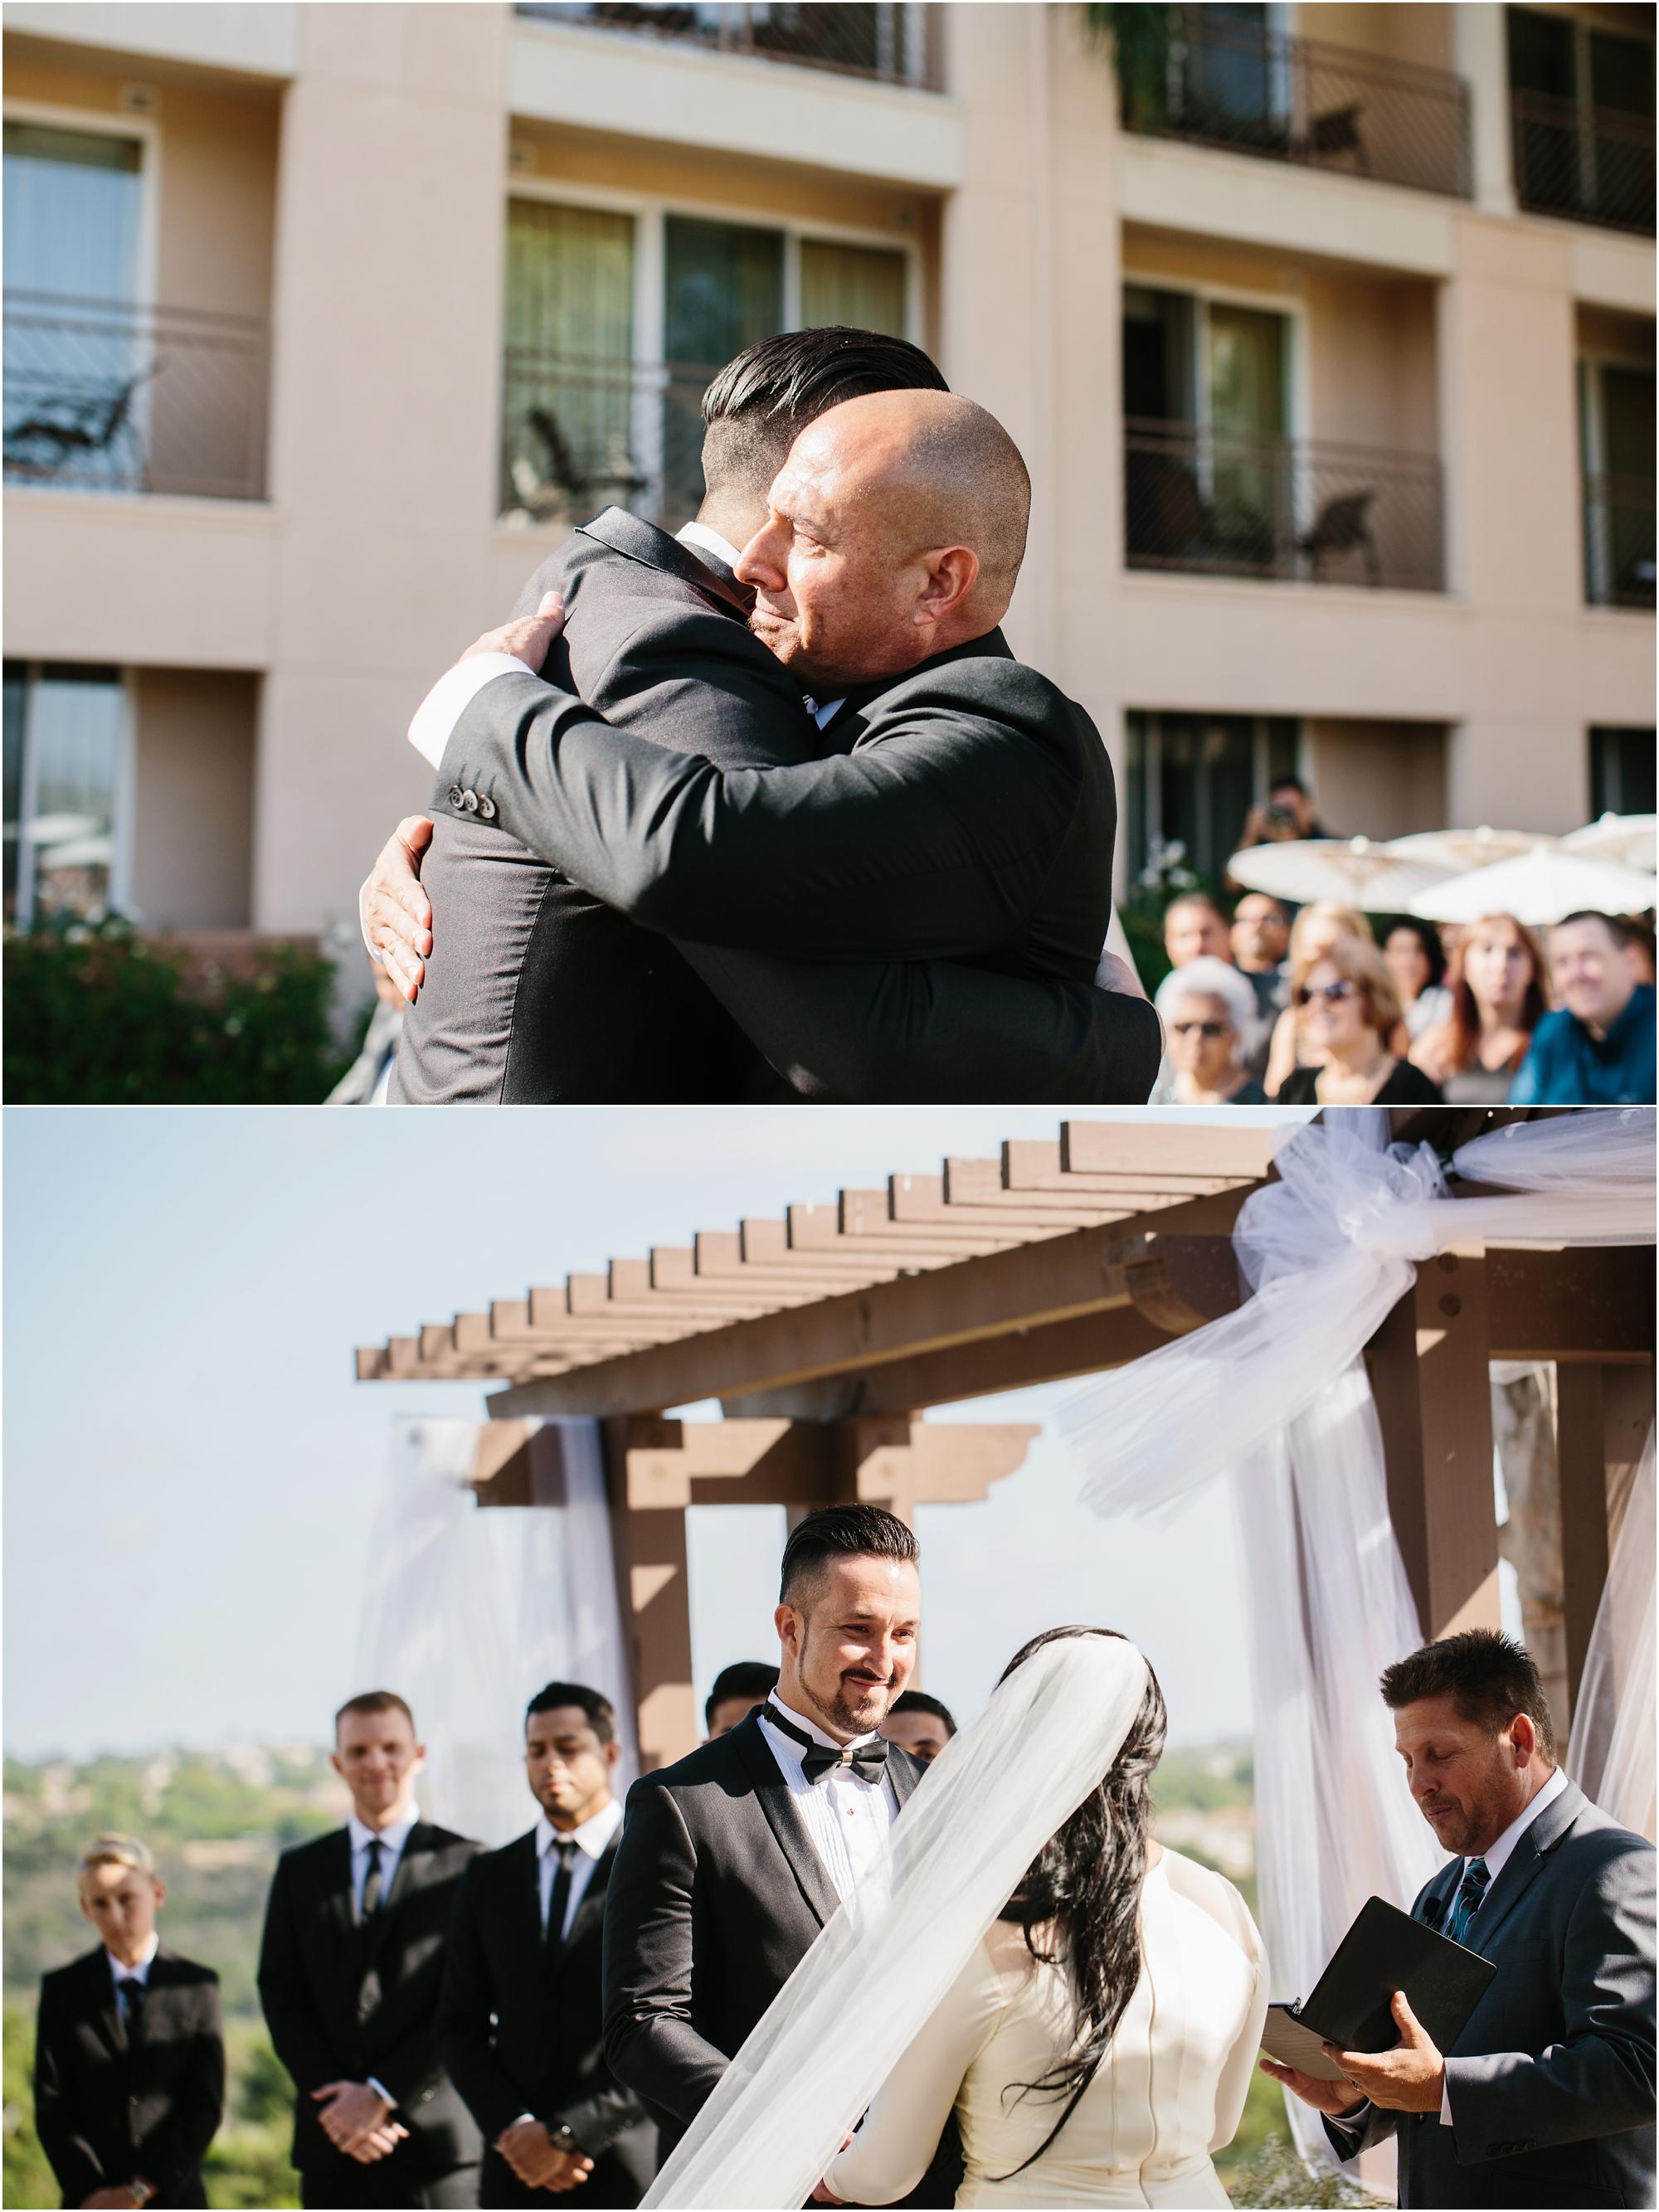 Beautiful San Diego Wedding Ceremony - http://brittneyhannonphotography.com